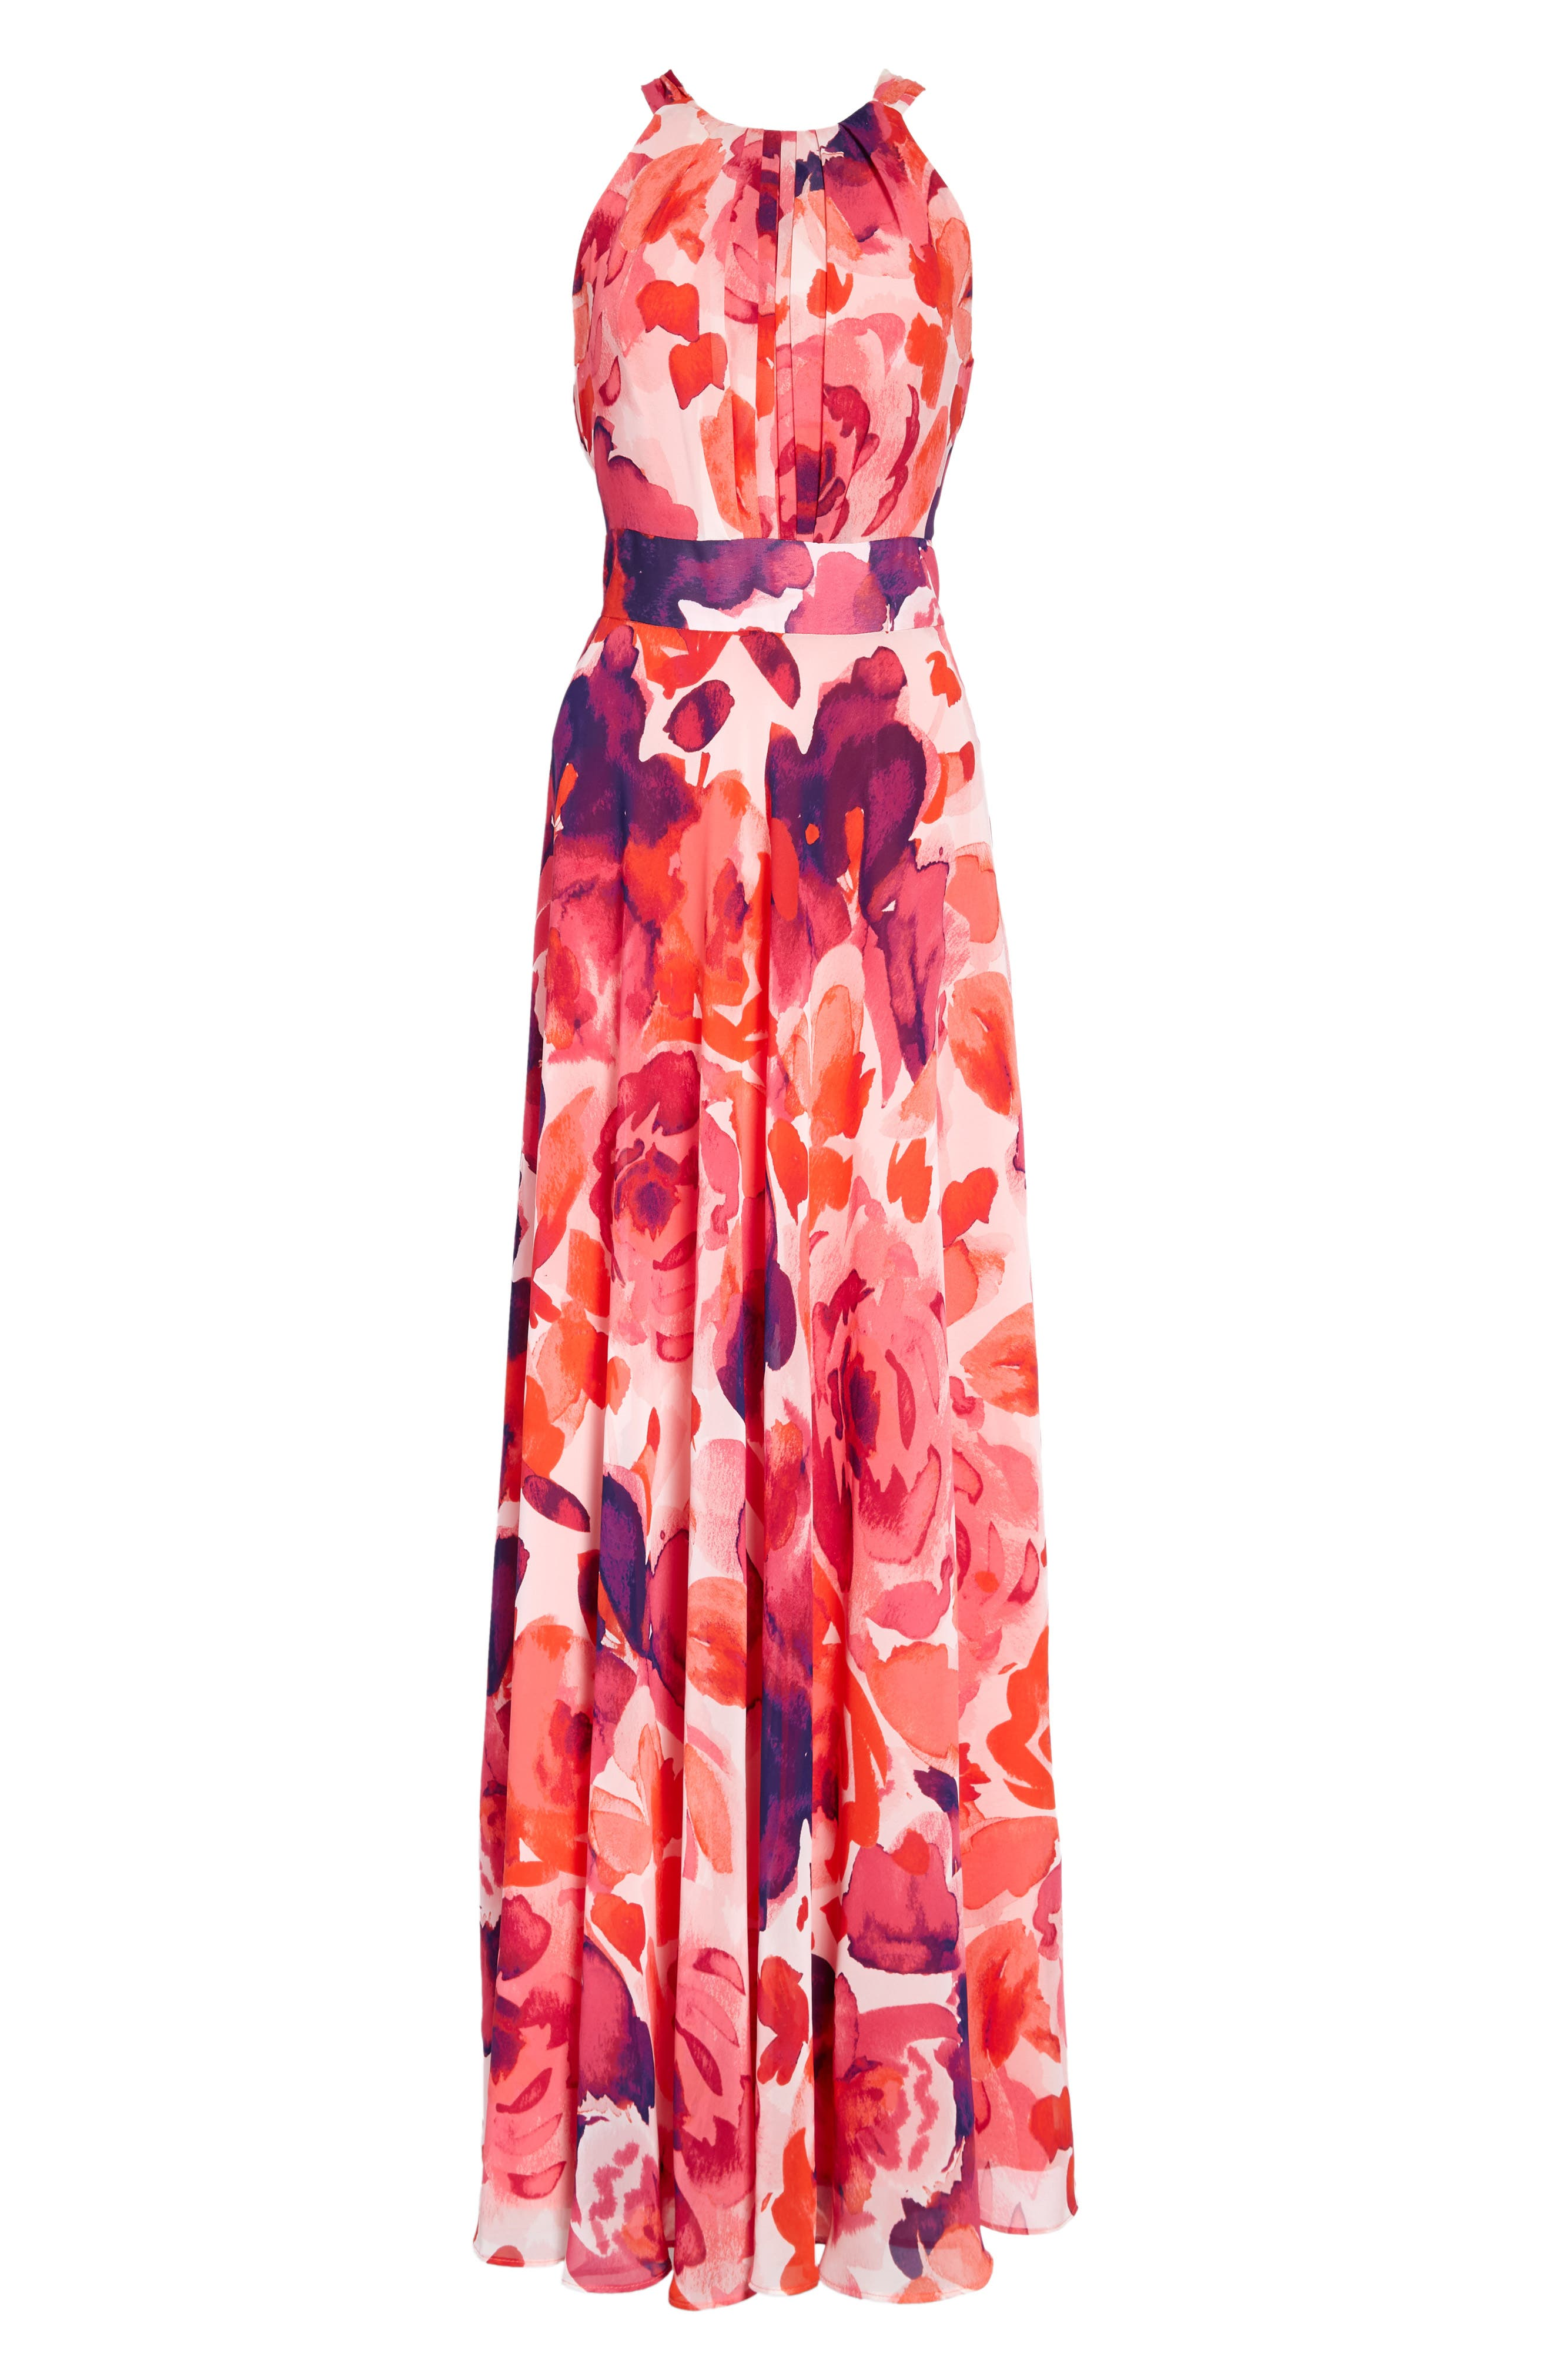 72b77386dac9 Eliza J Floral Print Halter Maxi Dress